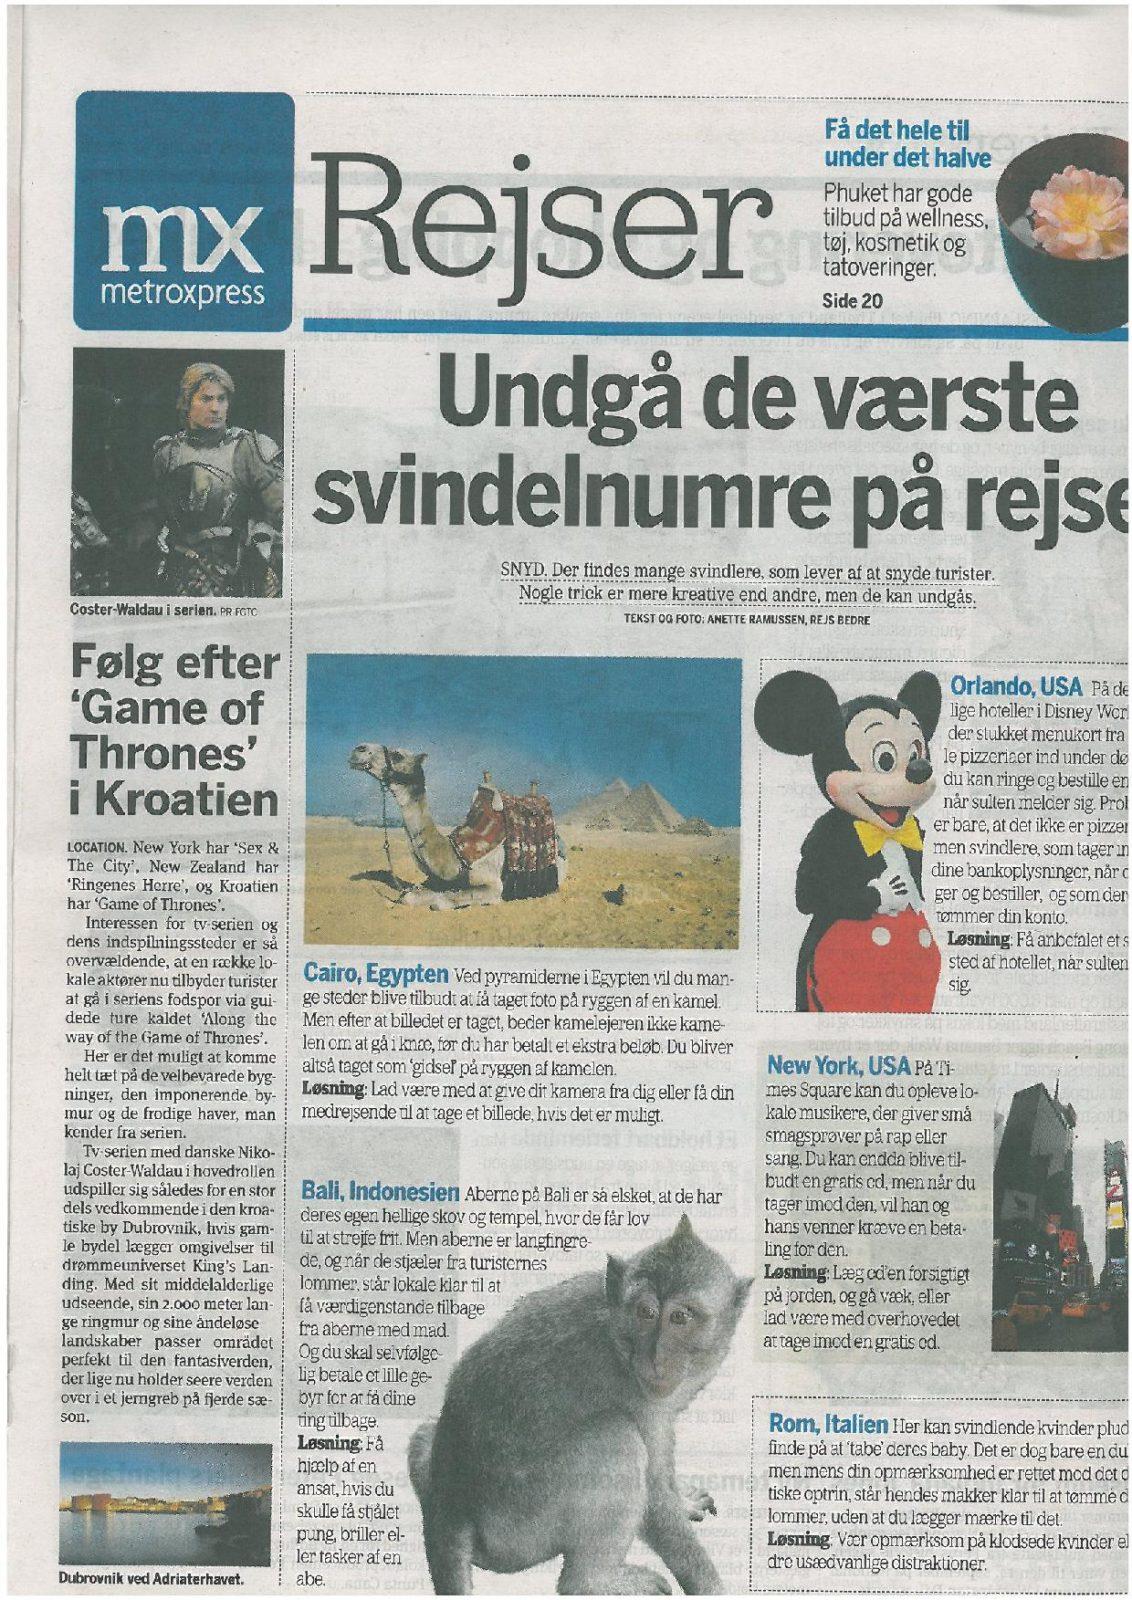 største rabat rimeligt prissat elegante sko Dubrovnik Game of Thrones tours popular as much as Sex & The ...